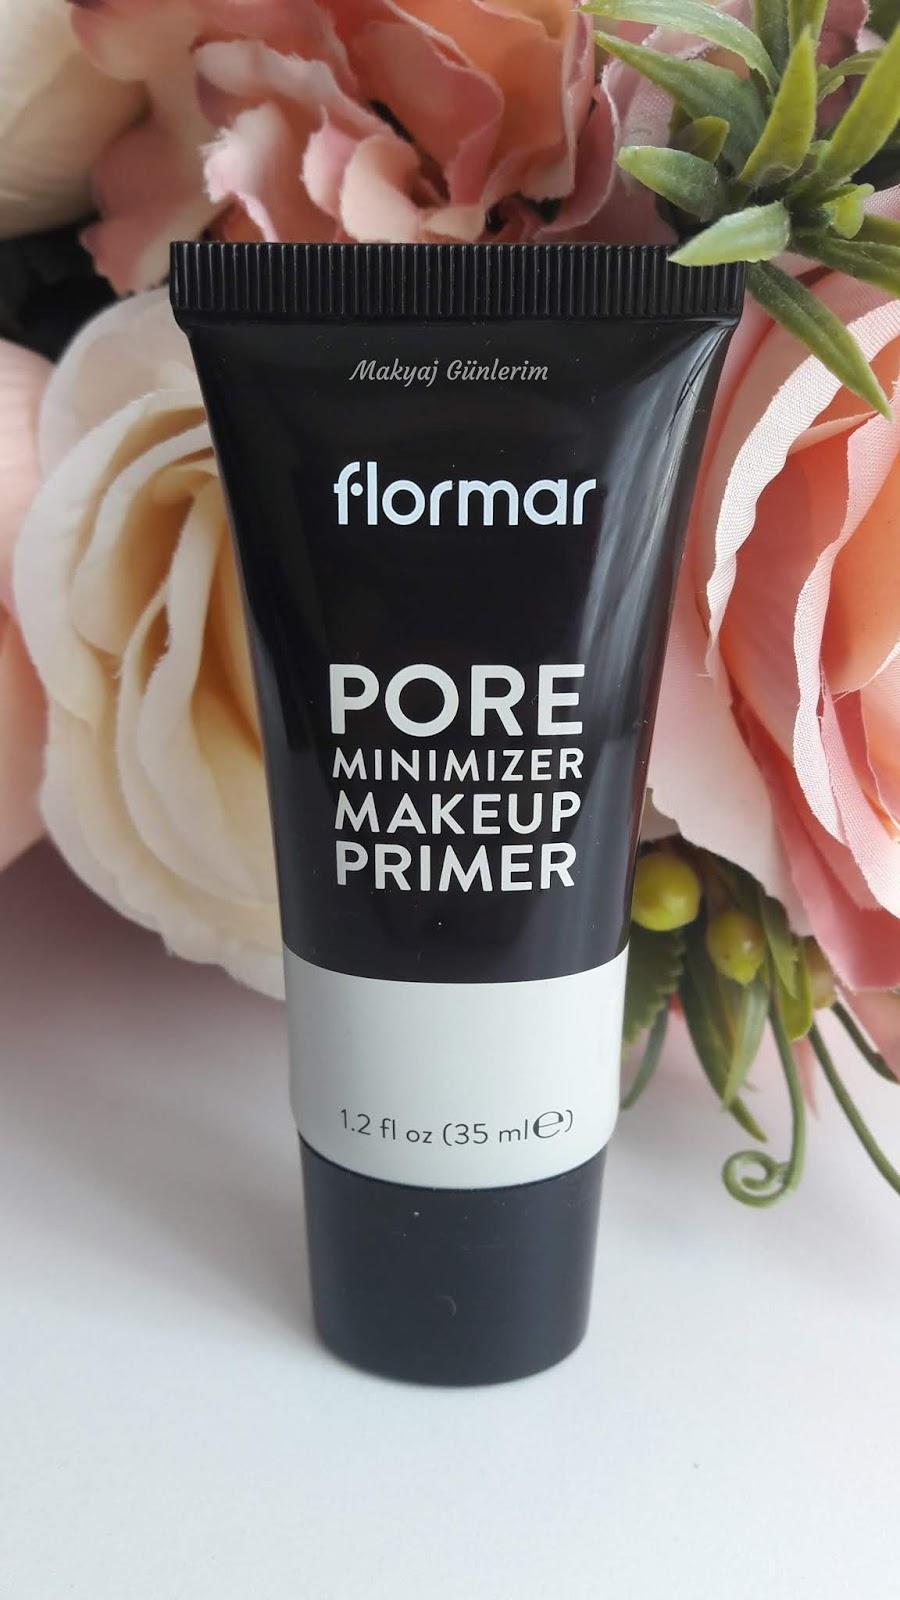 Makyaj Gunlerim Makyaj Sac Ve Cilt Bakimi Hakkinda Hersey Flormar Pore Minimizer Makeup Primer Makyaj Bazi